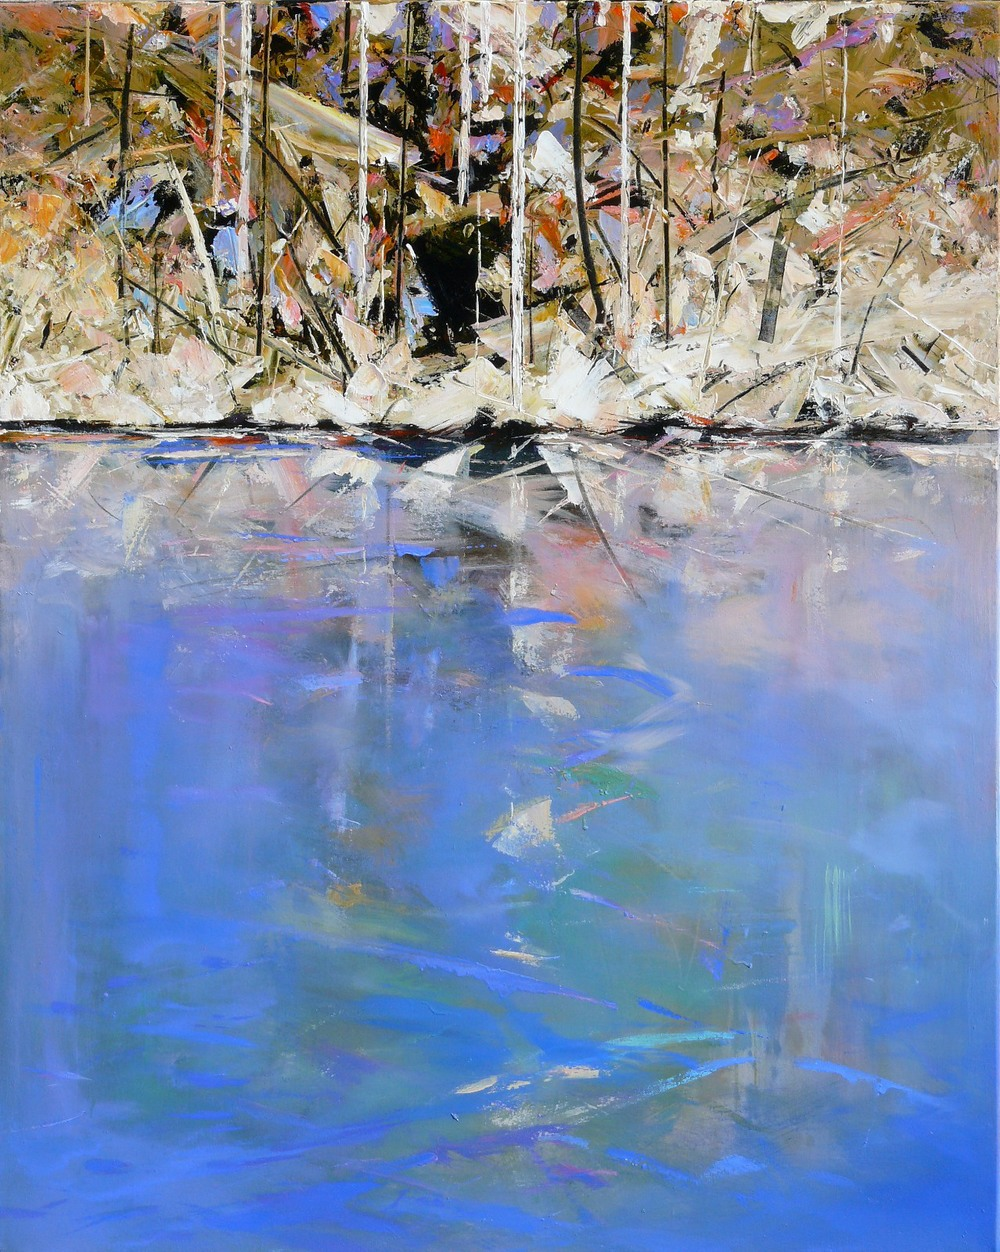 Paul Battams 'Akuna Bay' 150cm x 120cm